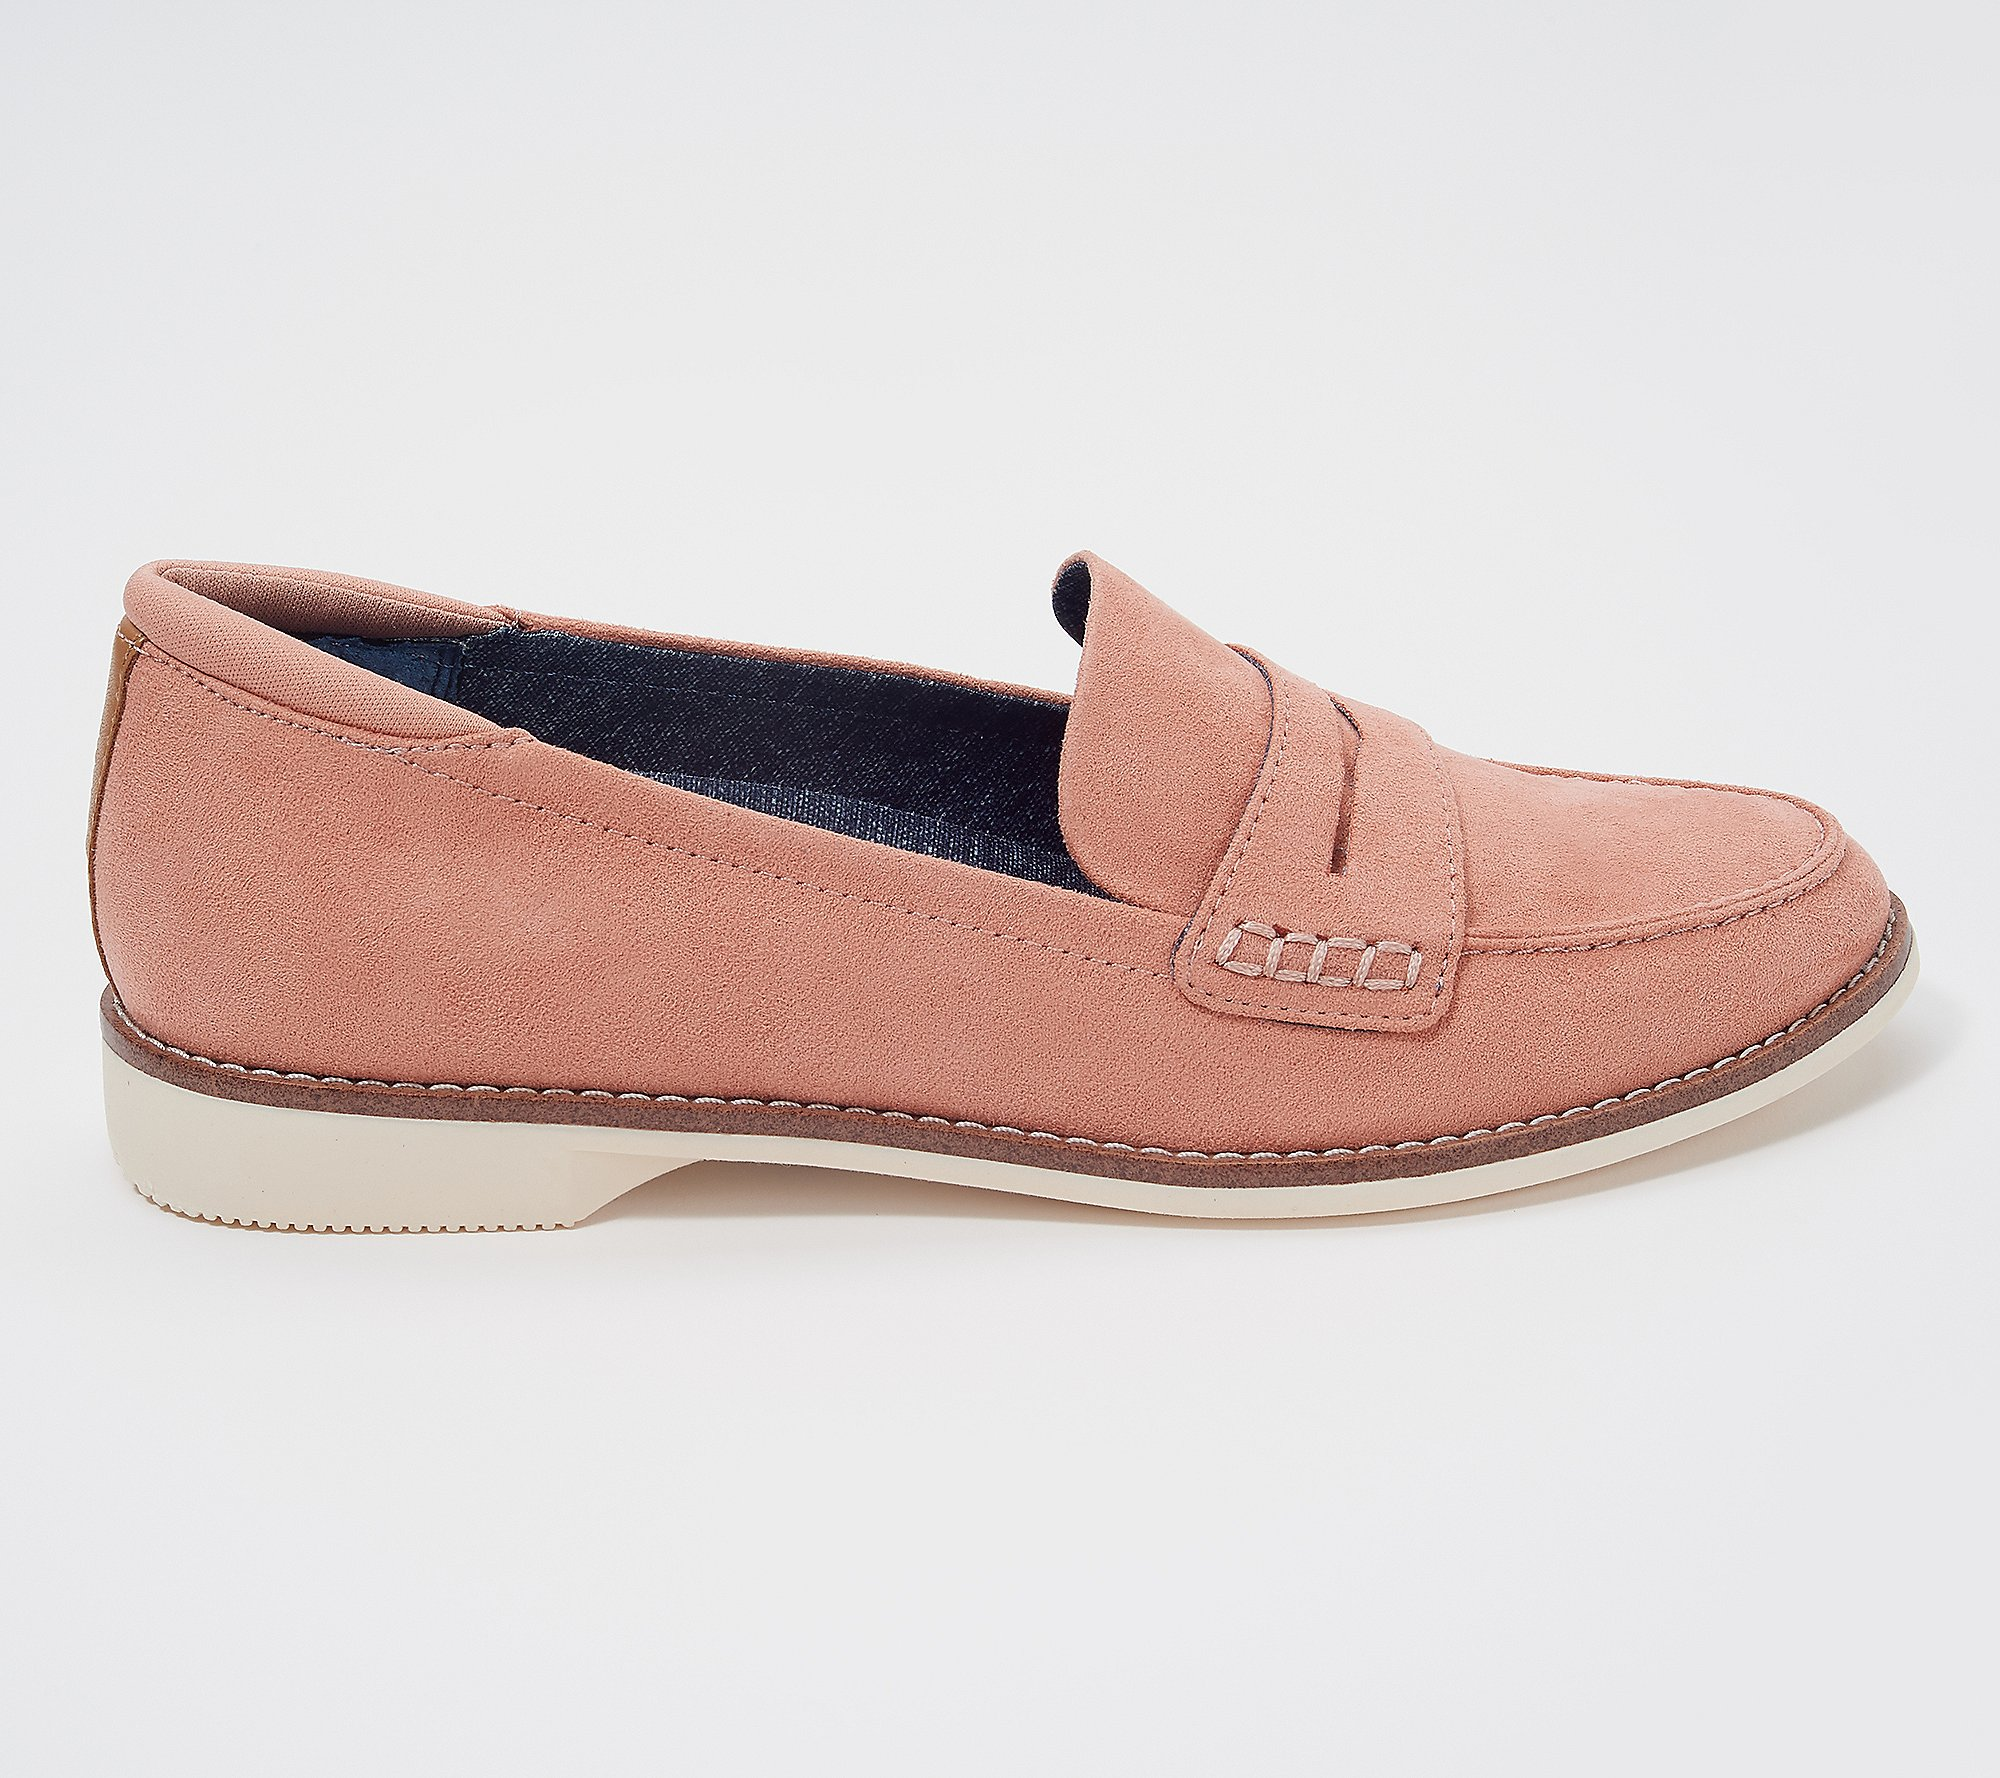 Scholl/'s Women/'s Cypress Loafer Choose SZ//color Details about  /Dr